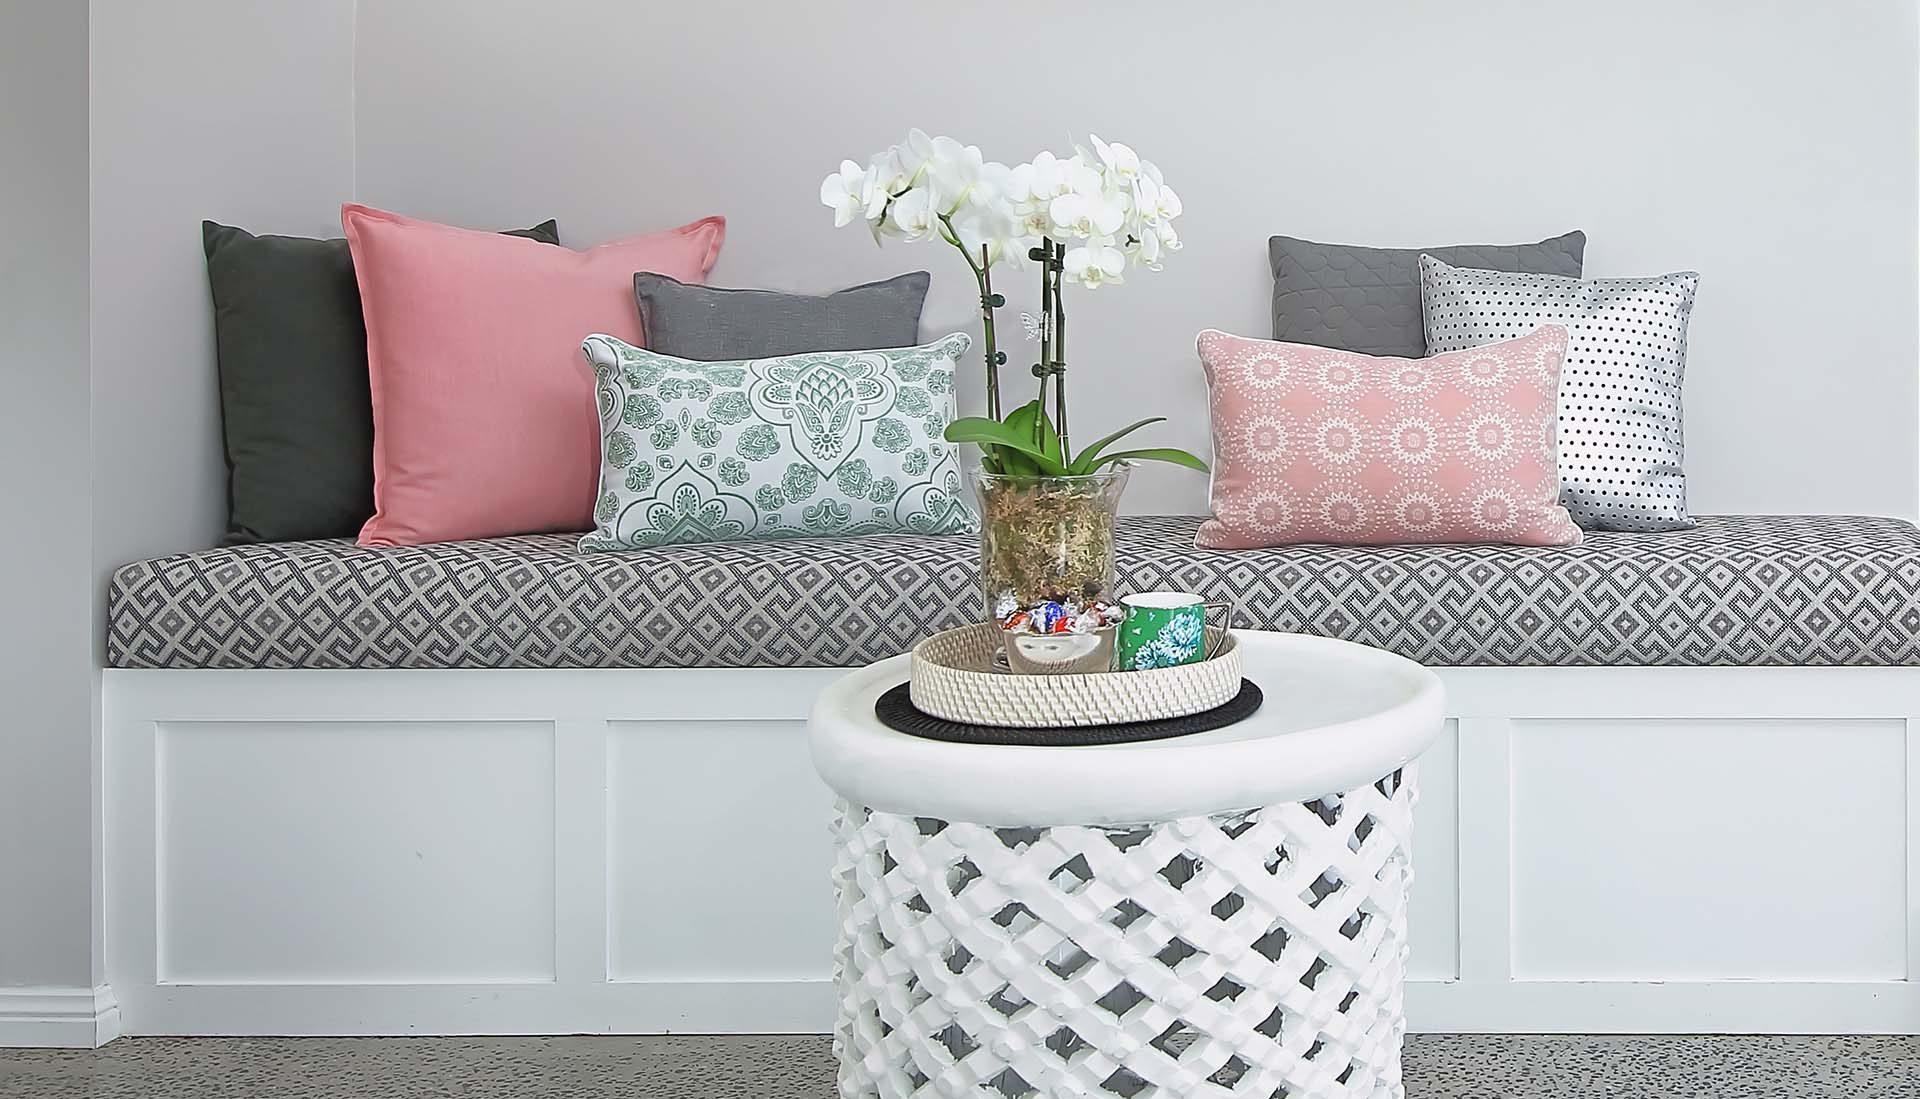 Custom Seat and Cushions